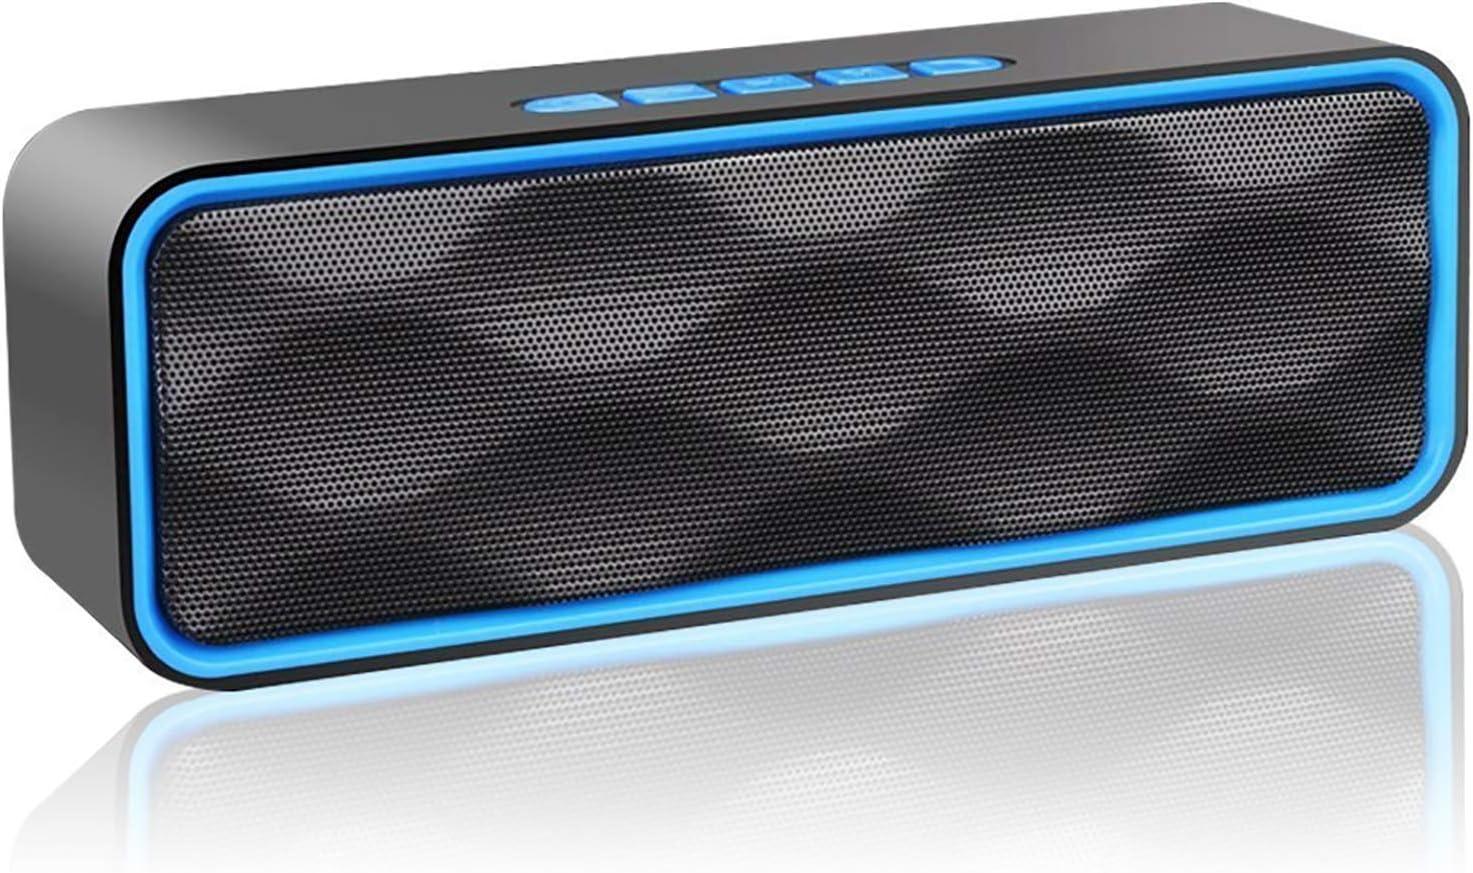 Aigoss Altavoz Bluetooth Portátil Inalámbrico Estereo Exteriores con Audio HD Altavoz de Doble Controlador Integrado, Bluetooth 4.2, Llamadas Manos Libres y TF Tarjeta, Azul